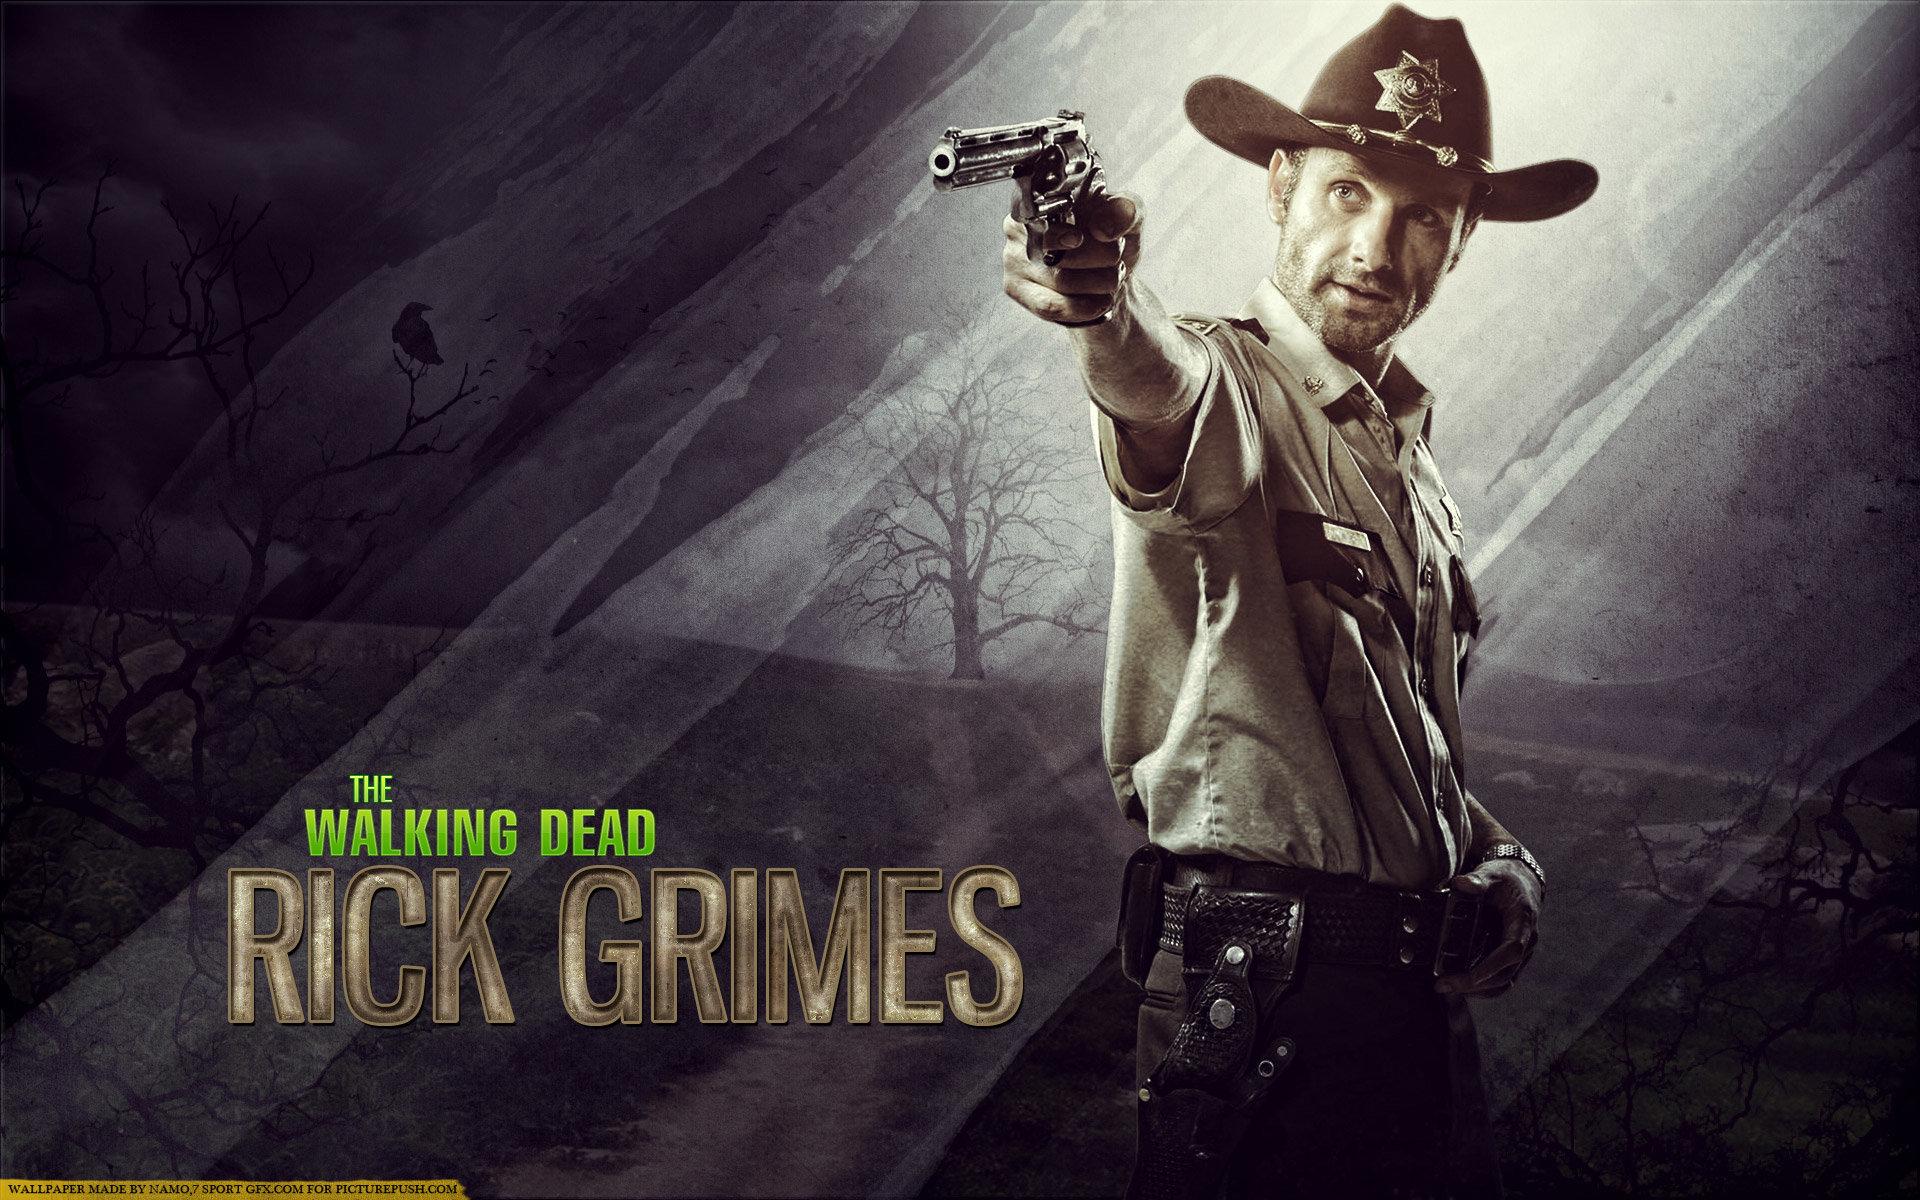 The Walking Dead Wallpapers 1920x1200 Desktop Backgrounds